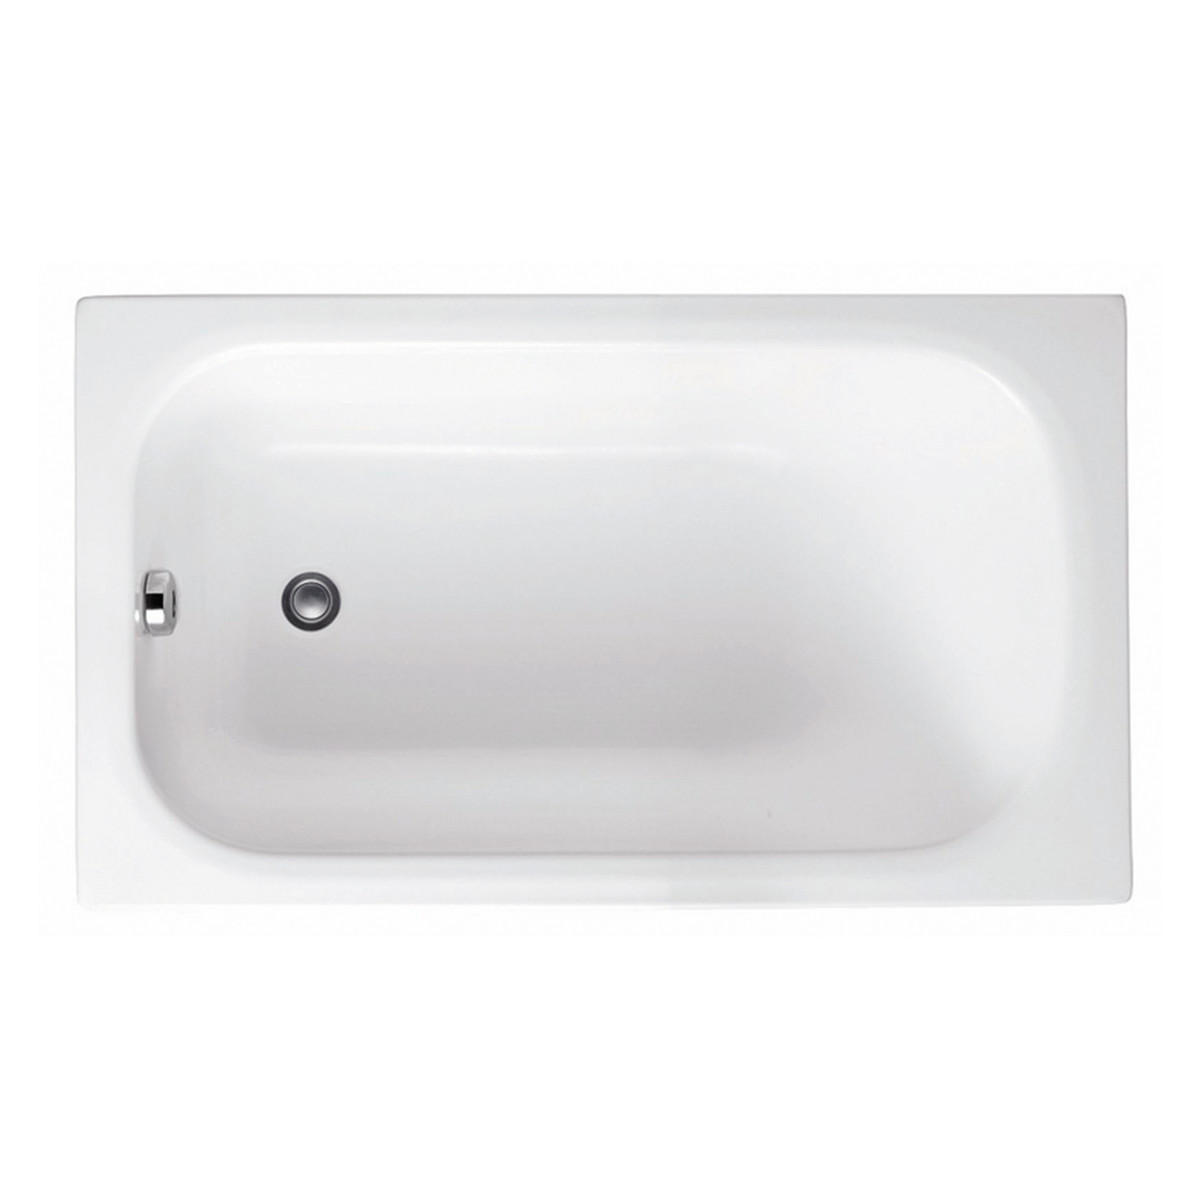 Vasca da bagno dimensioni ridotte vasche da bagno misure vasca da bagno di dimensioni ridotte - Vasca da bagno dimensioni ...